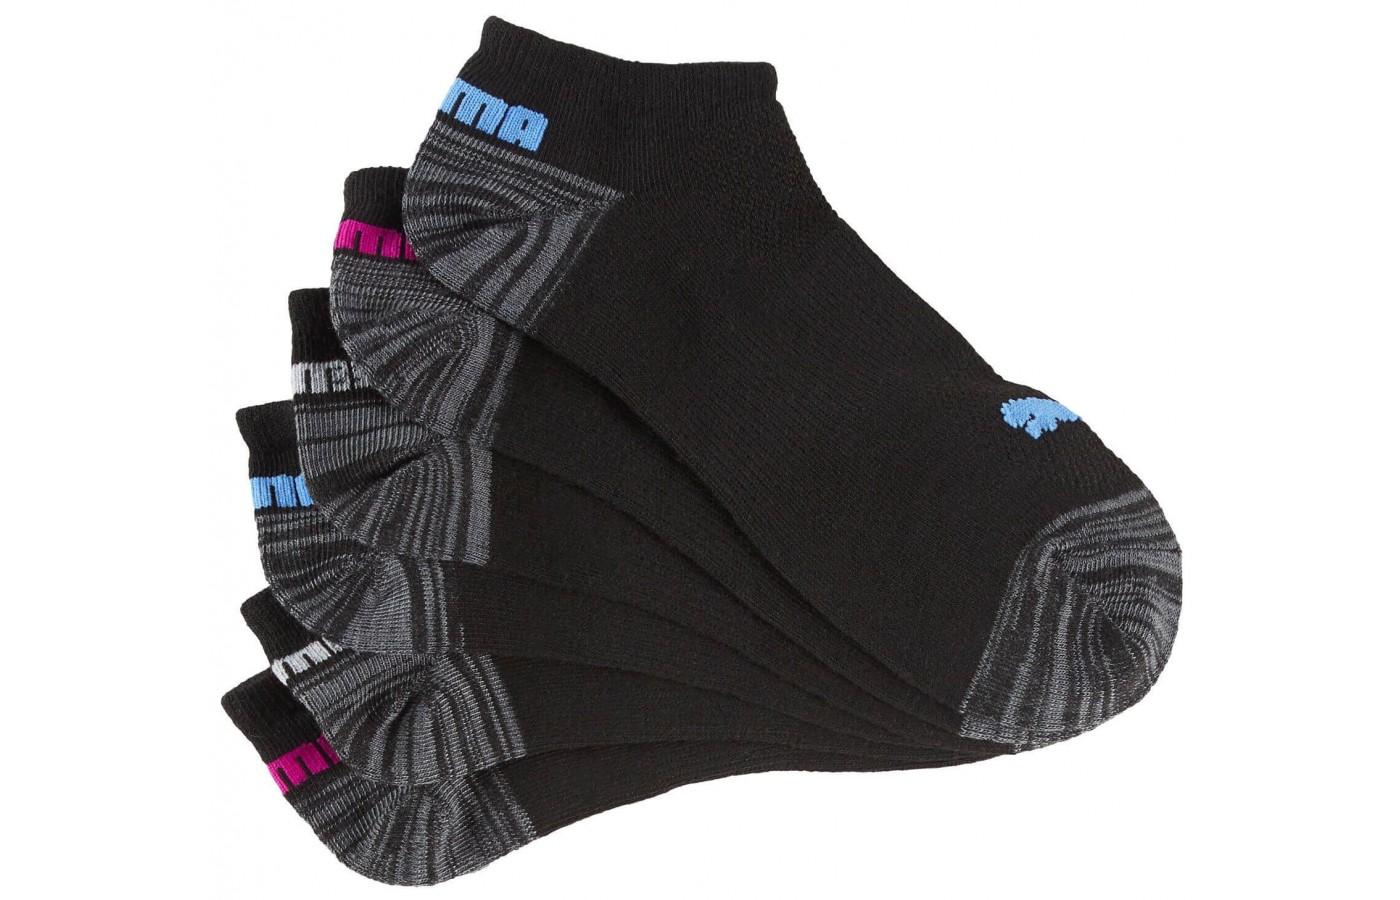 Puma No Show Socks Multi Pack